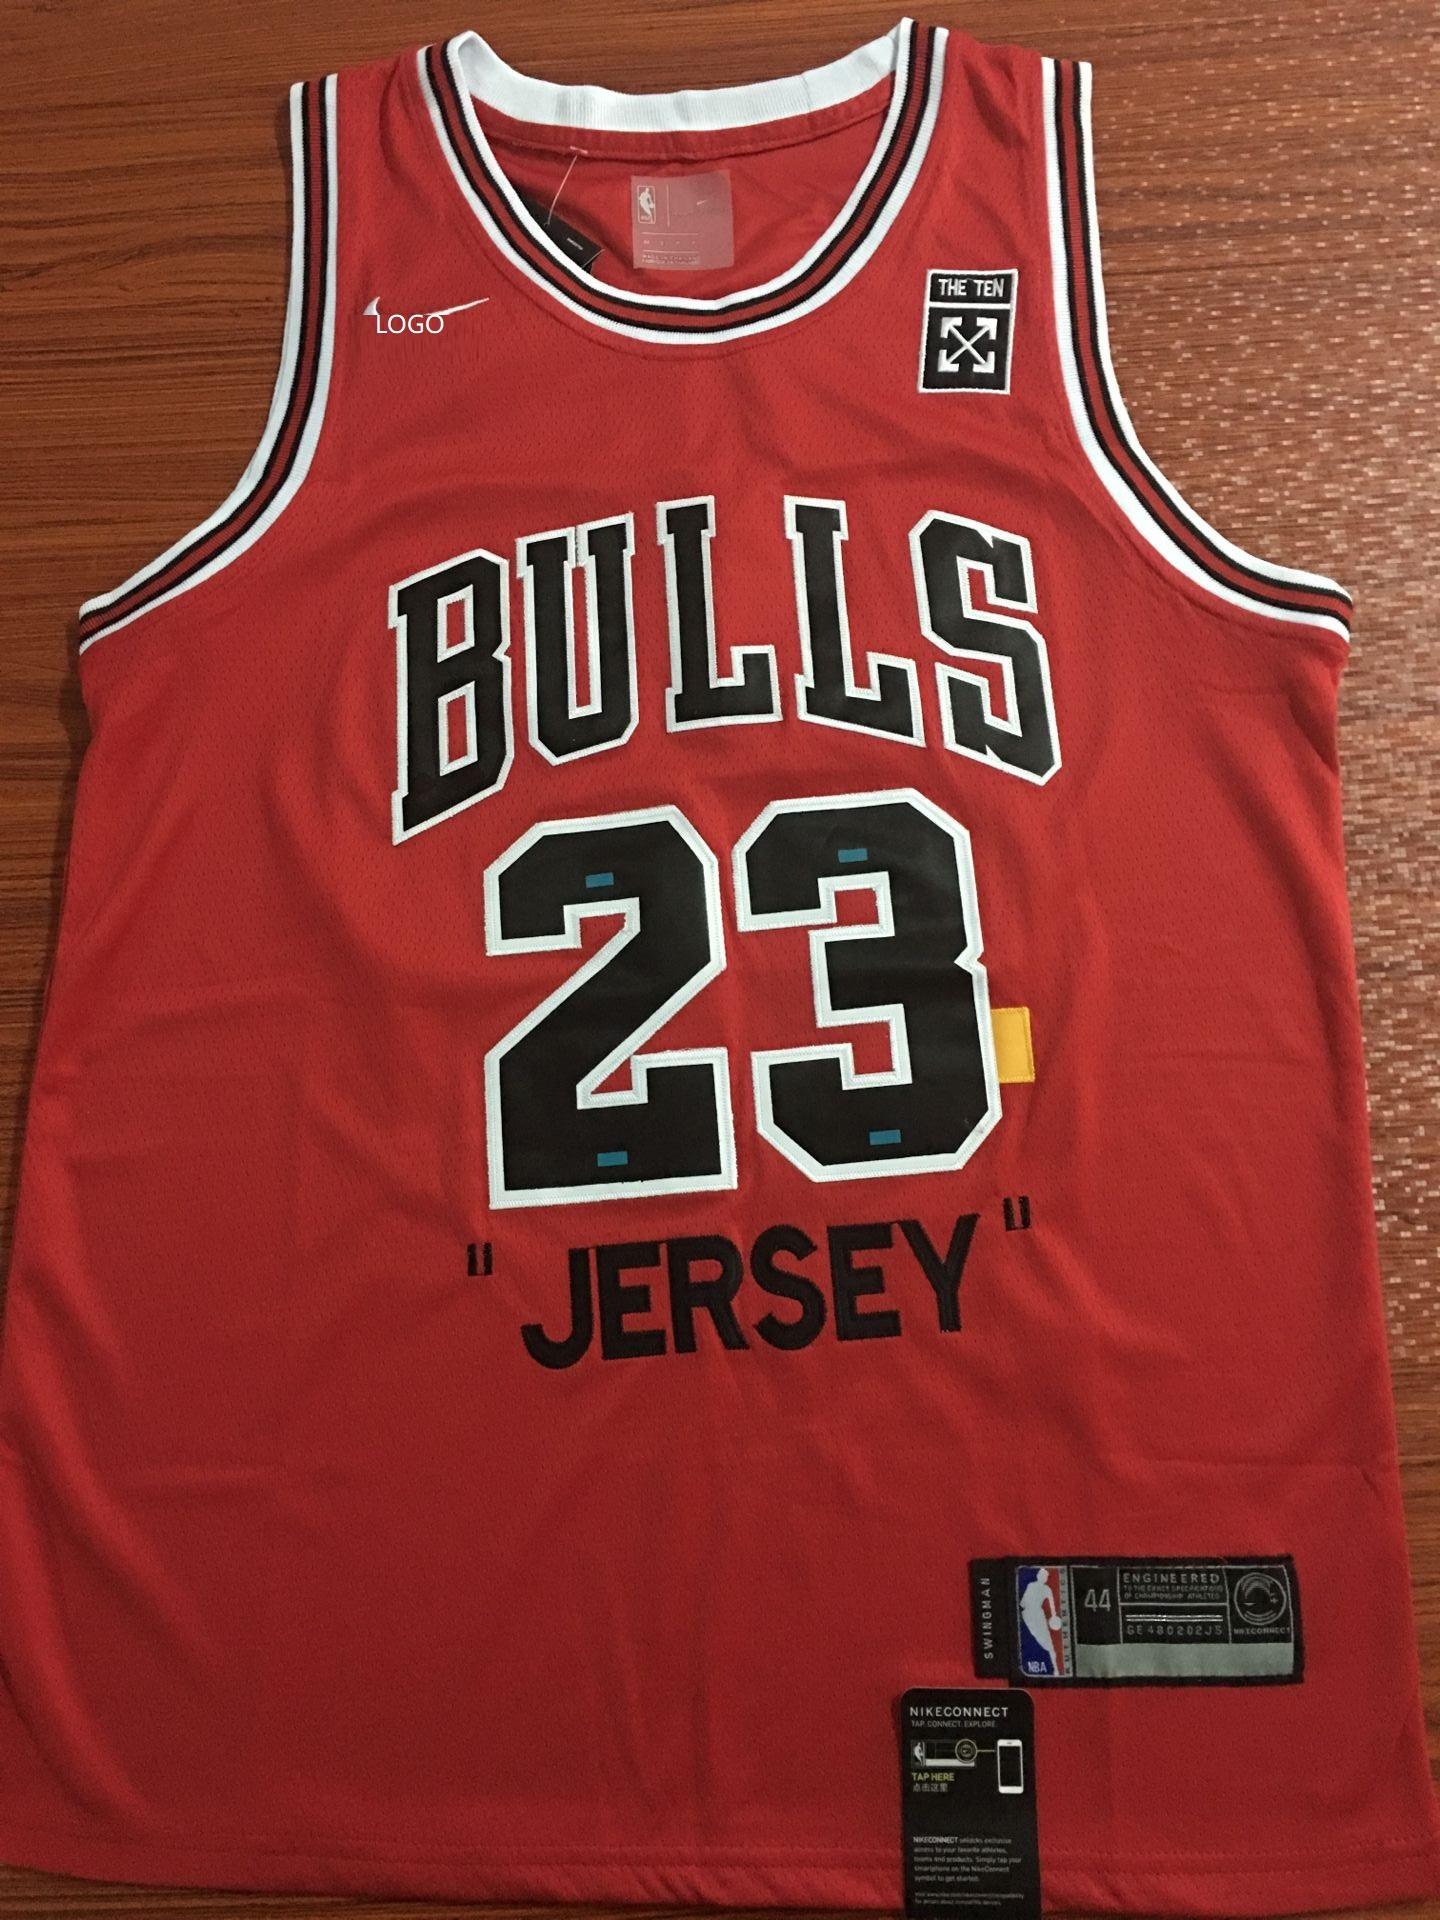 separation shoes 6d72b 150fe 2019/20 Adult bulls jordan 23 red basketball jersey